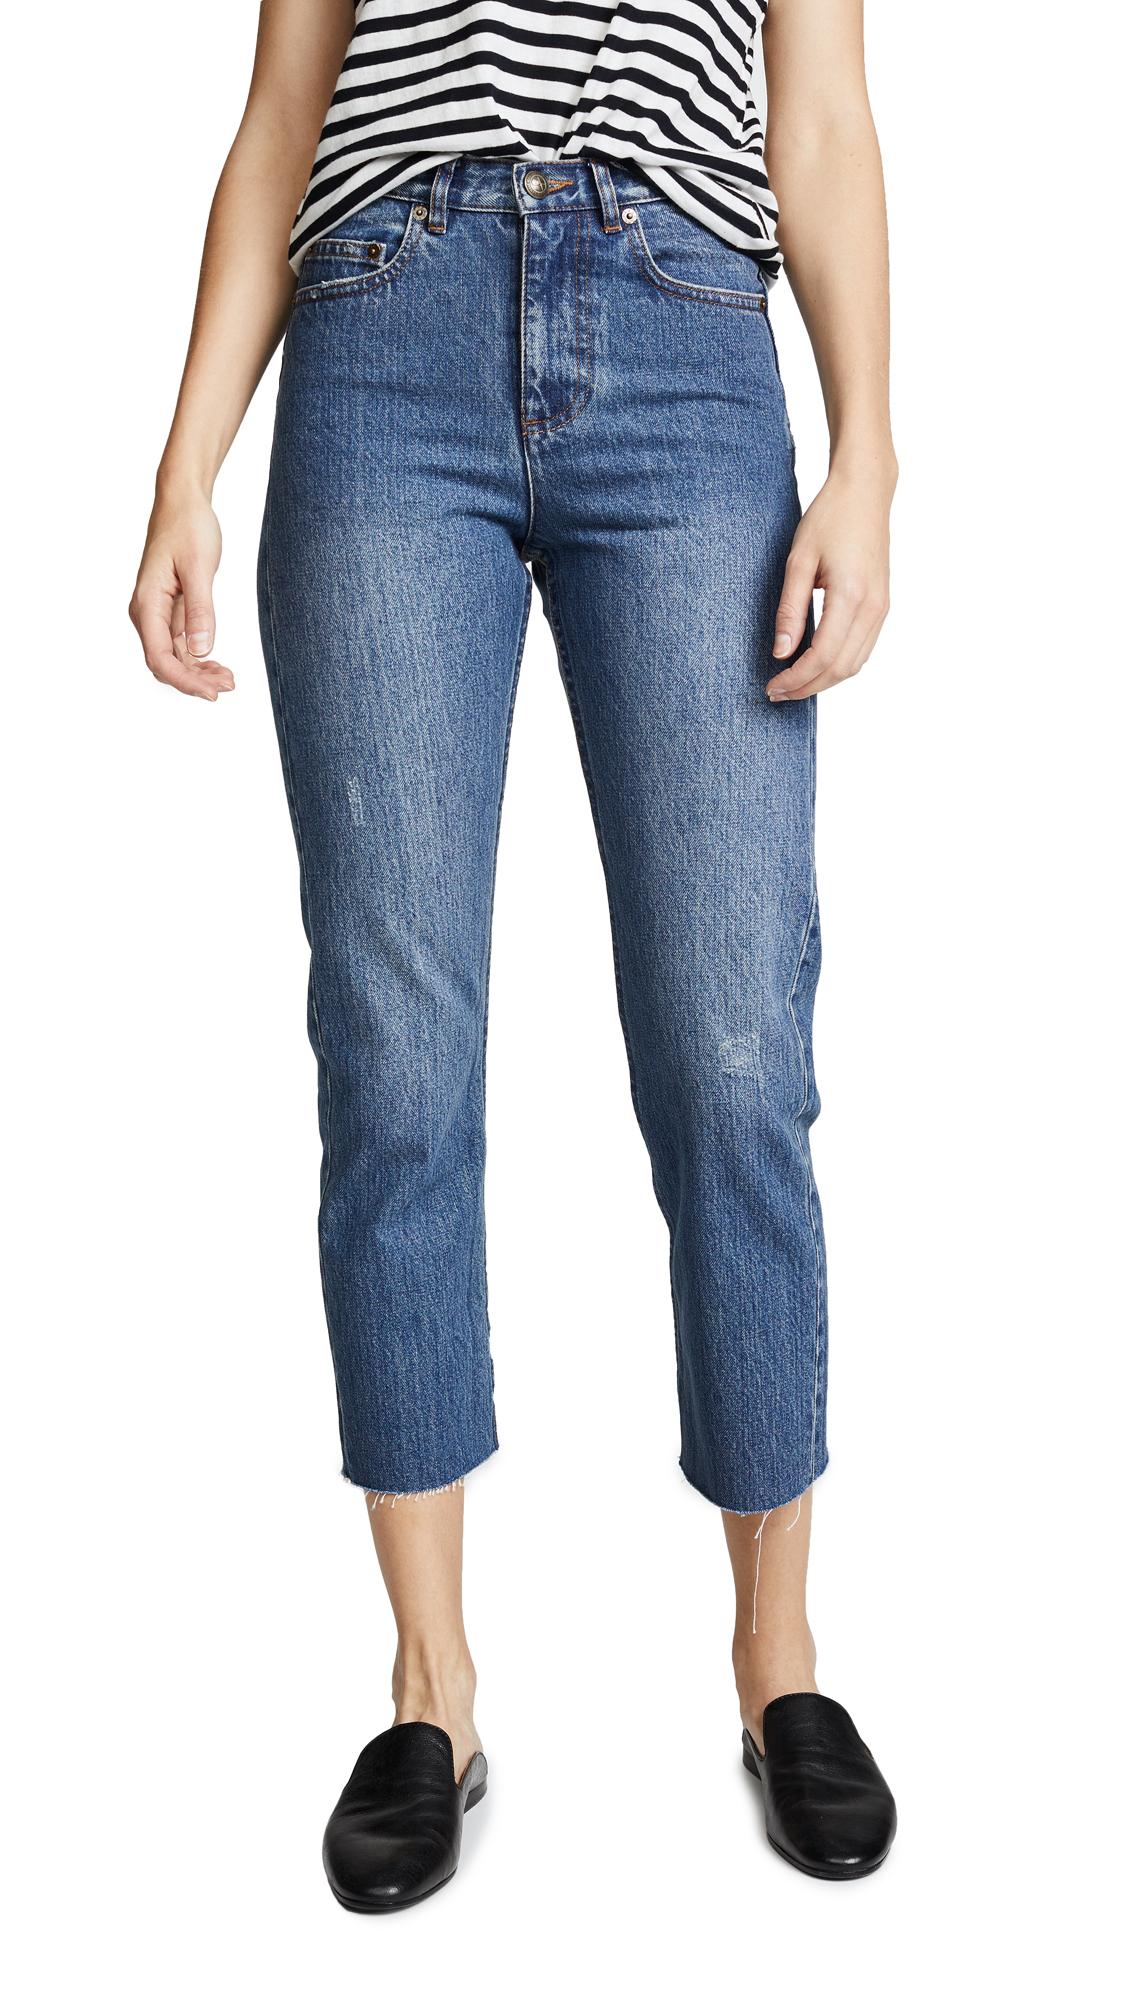 A.P.C. Standard Coupe Jeans